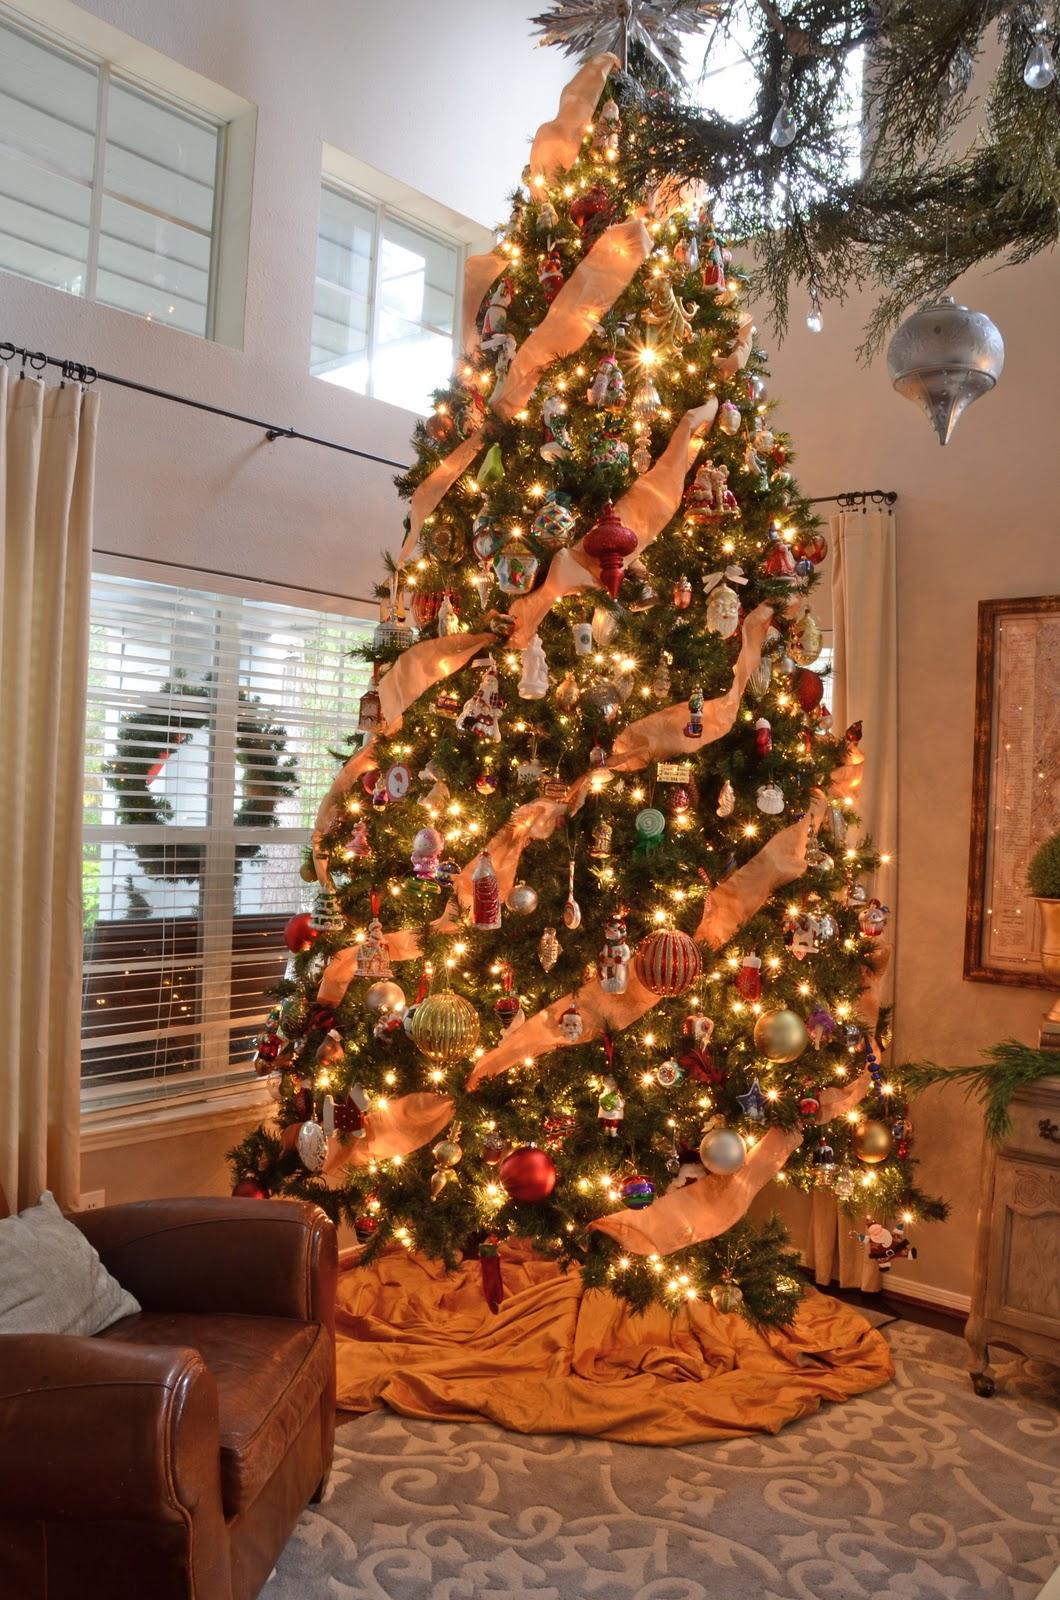 Orange And Lemon Christmas Tree Decorations : Amanda carol interiors